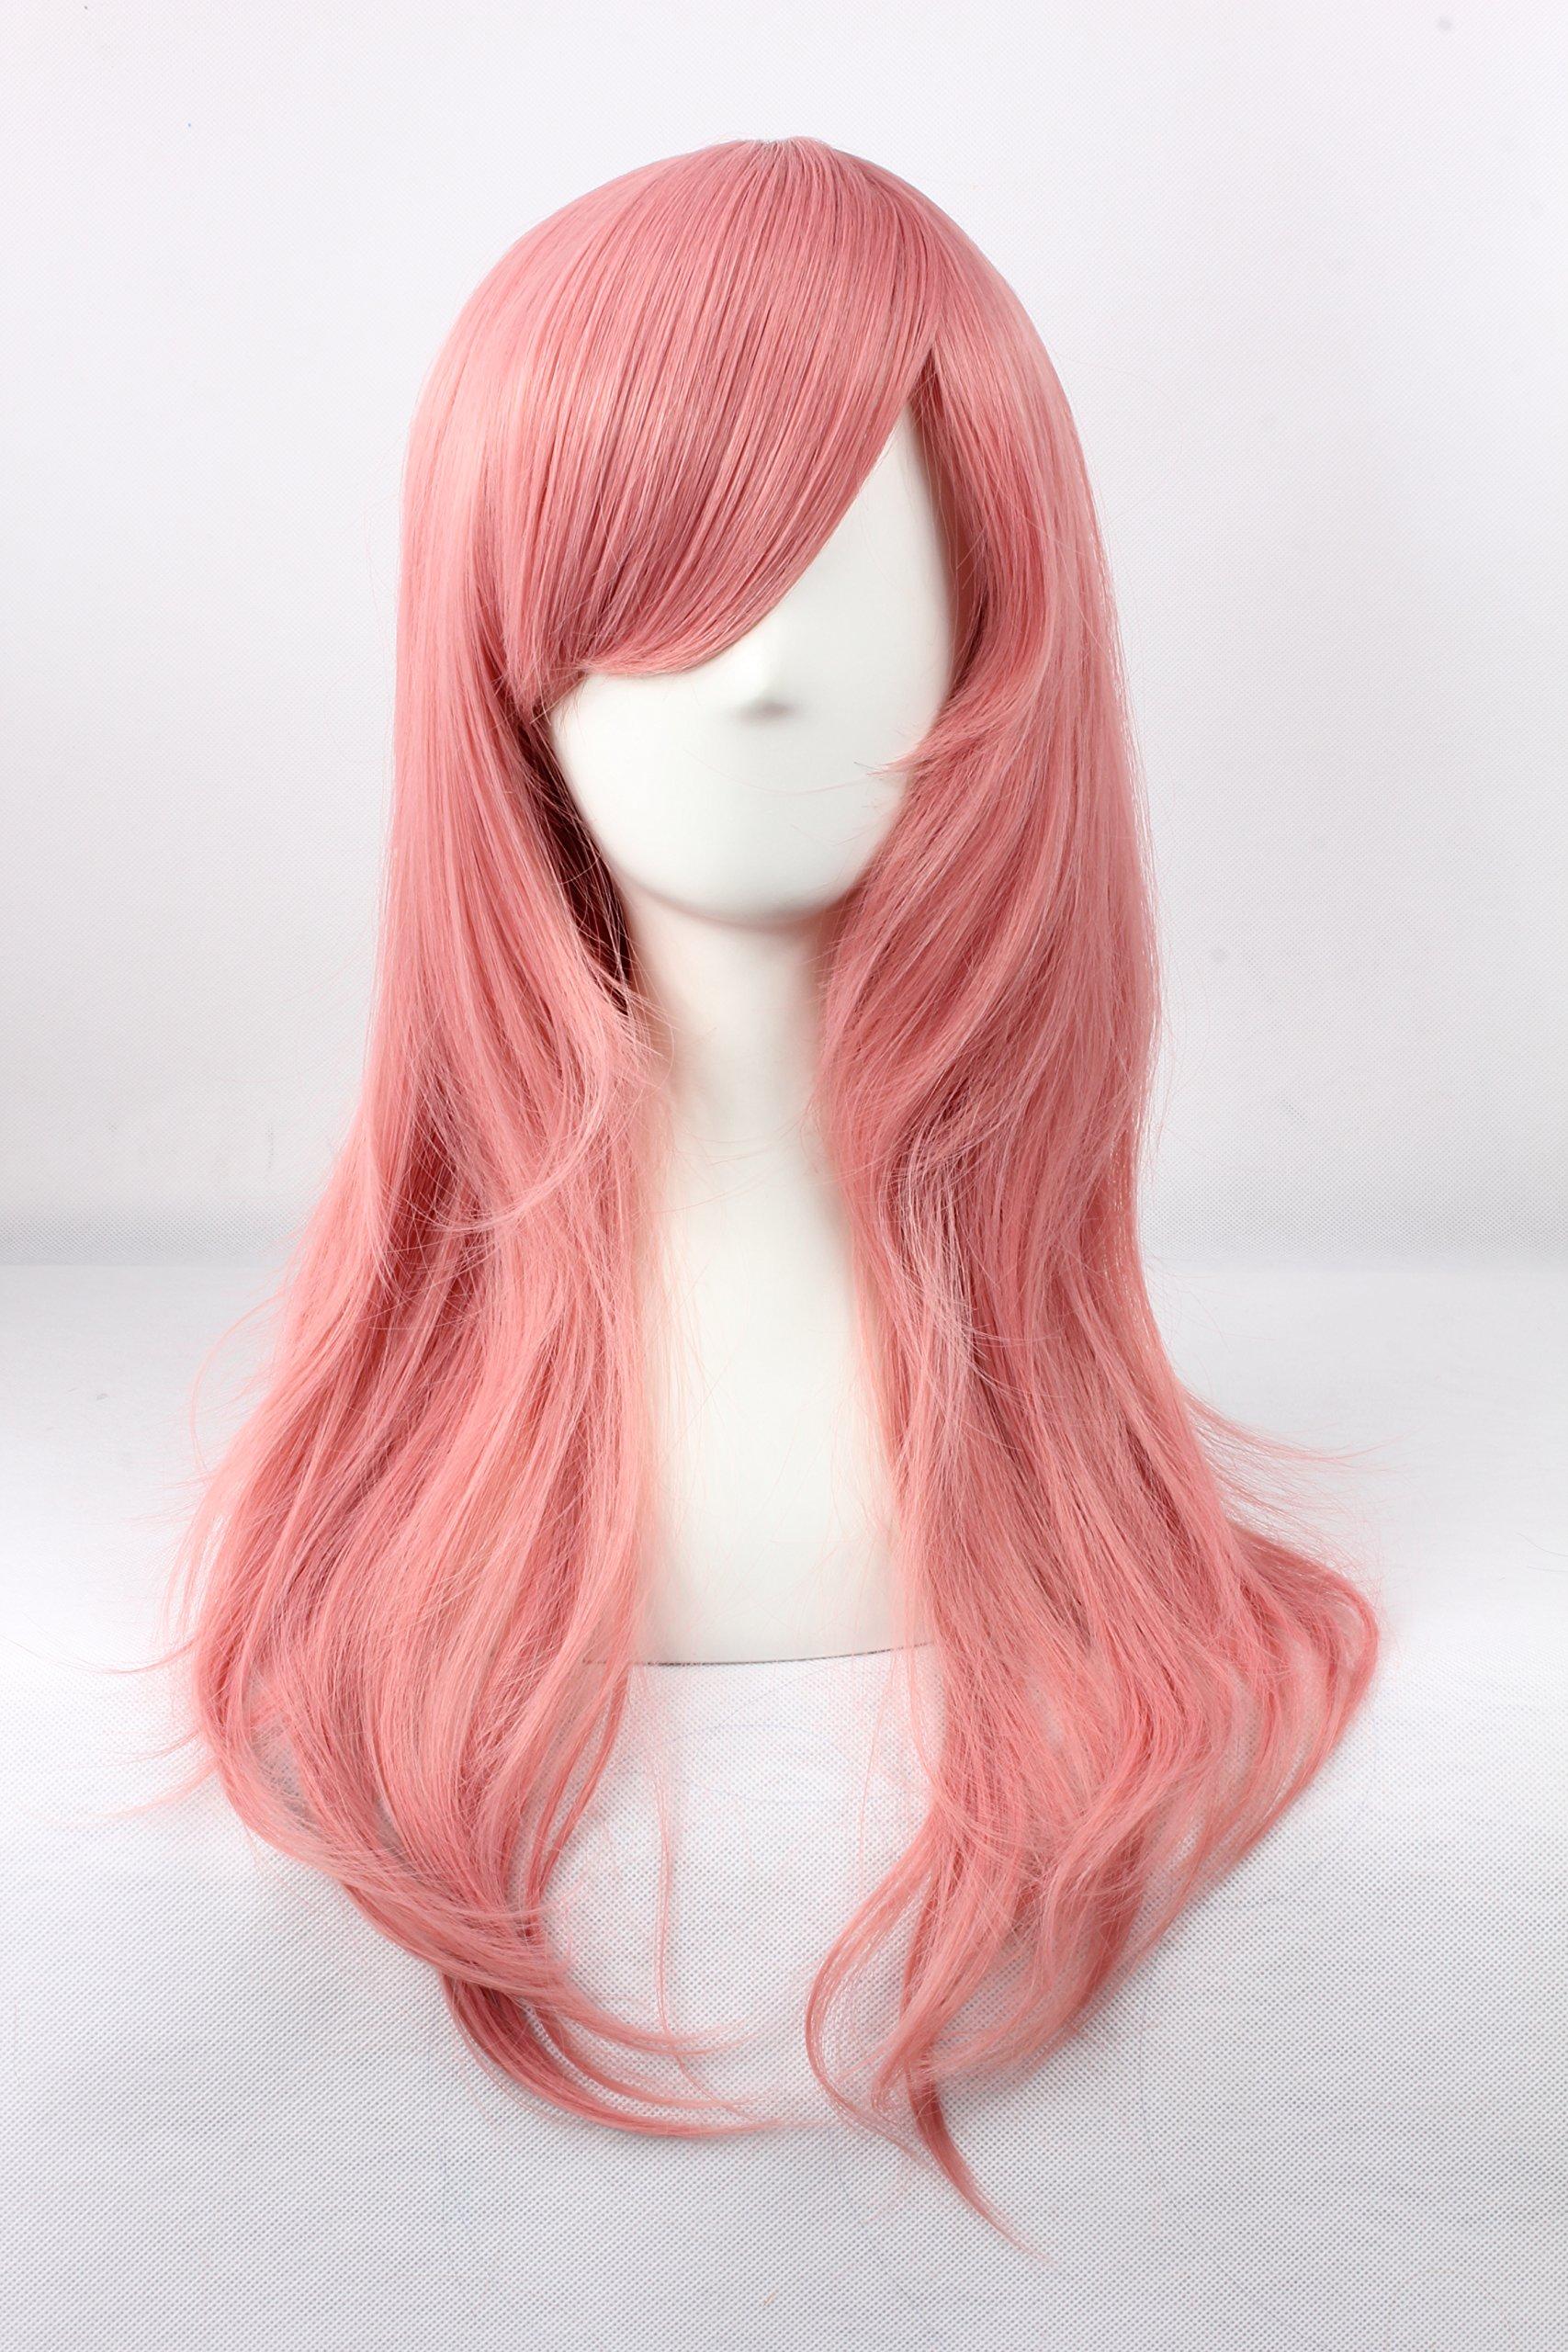 Coolsky Arakawa Under the Bridge Maria Long Mixed Light Pink Wigs Home Tutor Cosplay Hair Wig